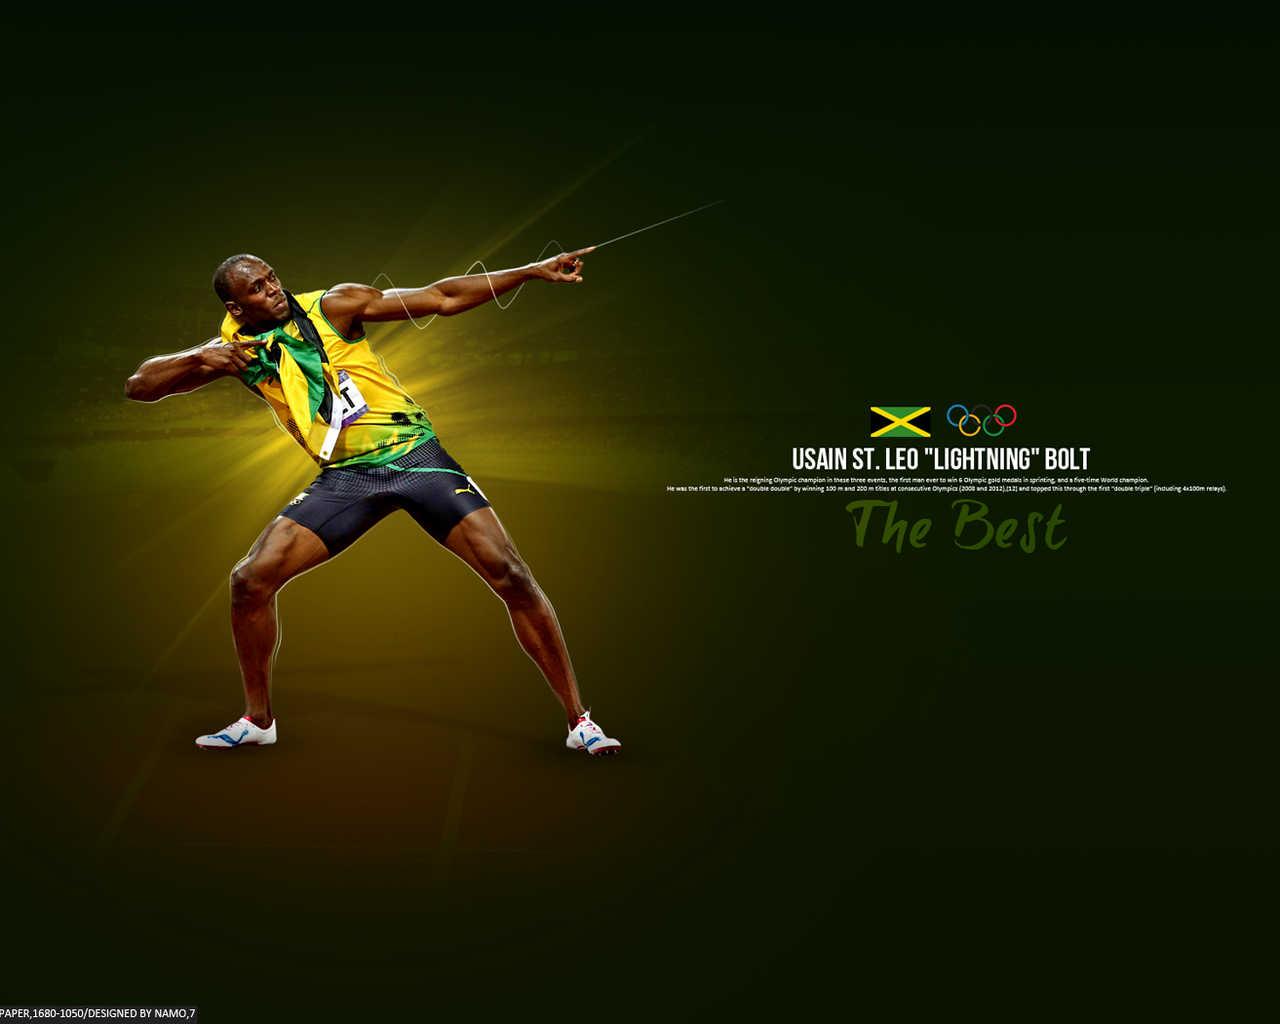 http://3.bp.blogspot.com/-32DKnj5wXQw/UCiFH-yivEI/AAAAAAAABi8/Wu8MwOZc4nU/s1600/Wallpaper+Usain+Bolt.jpg